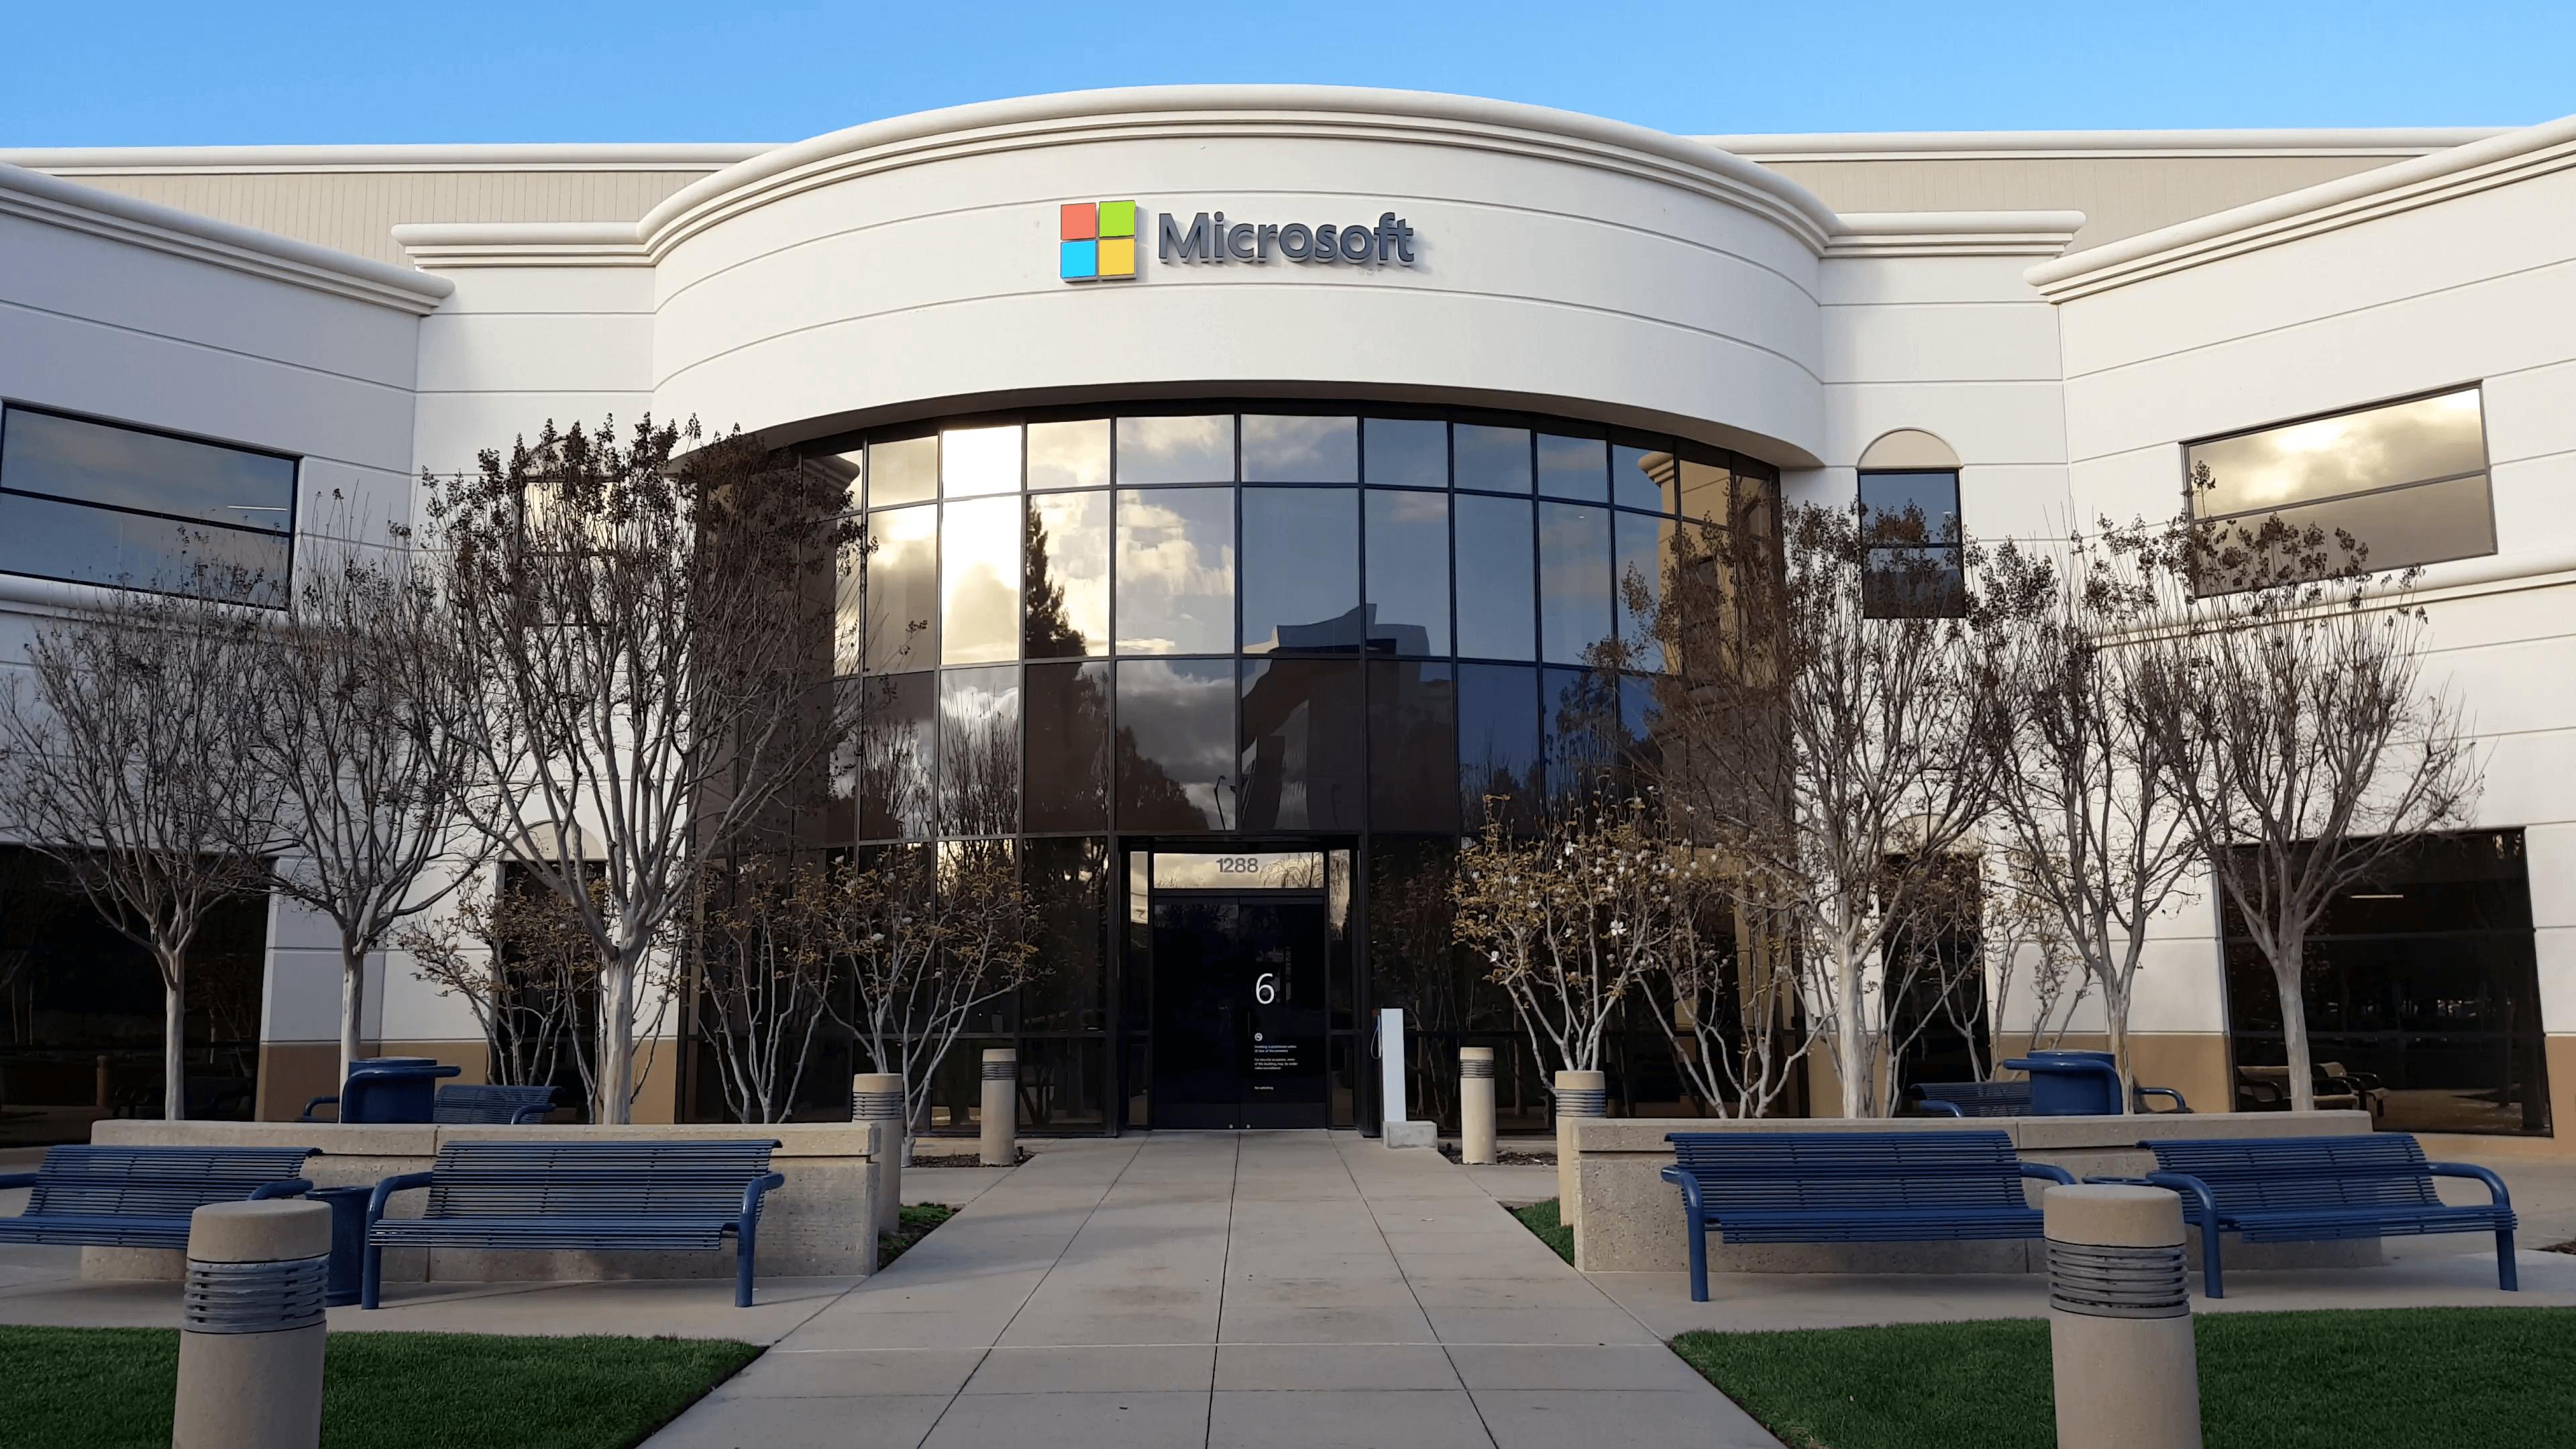 O maior erro de Bill Gates que custou US$ 400 bi à Microsoft